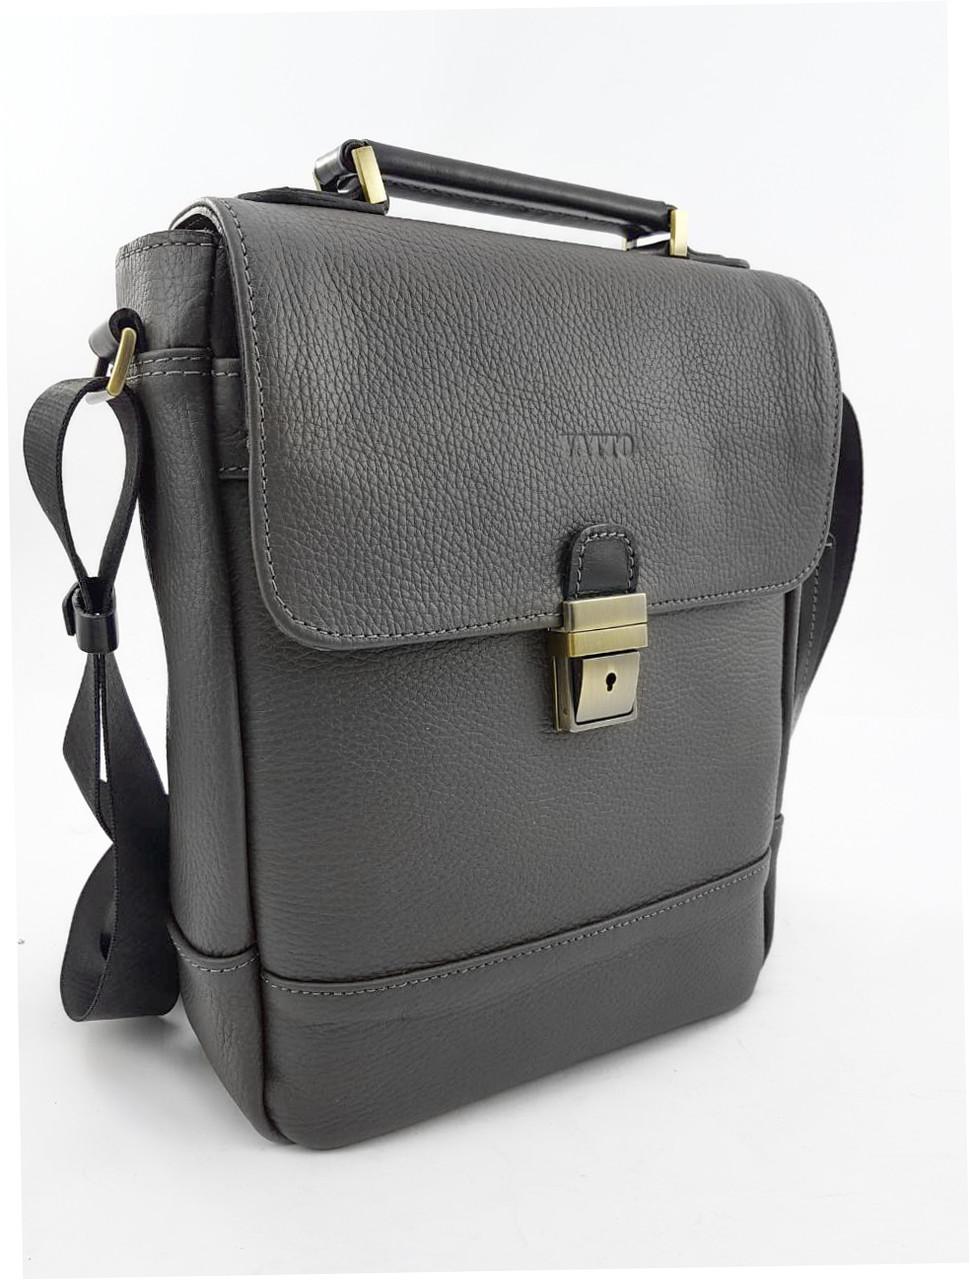 Мужская сумка VATTO Mk28.2 F13Kaz400